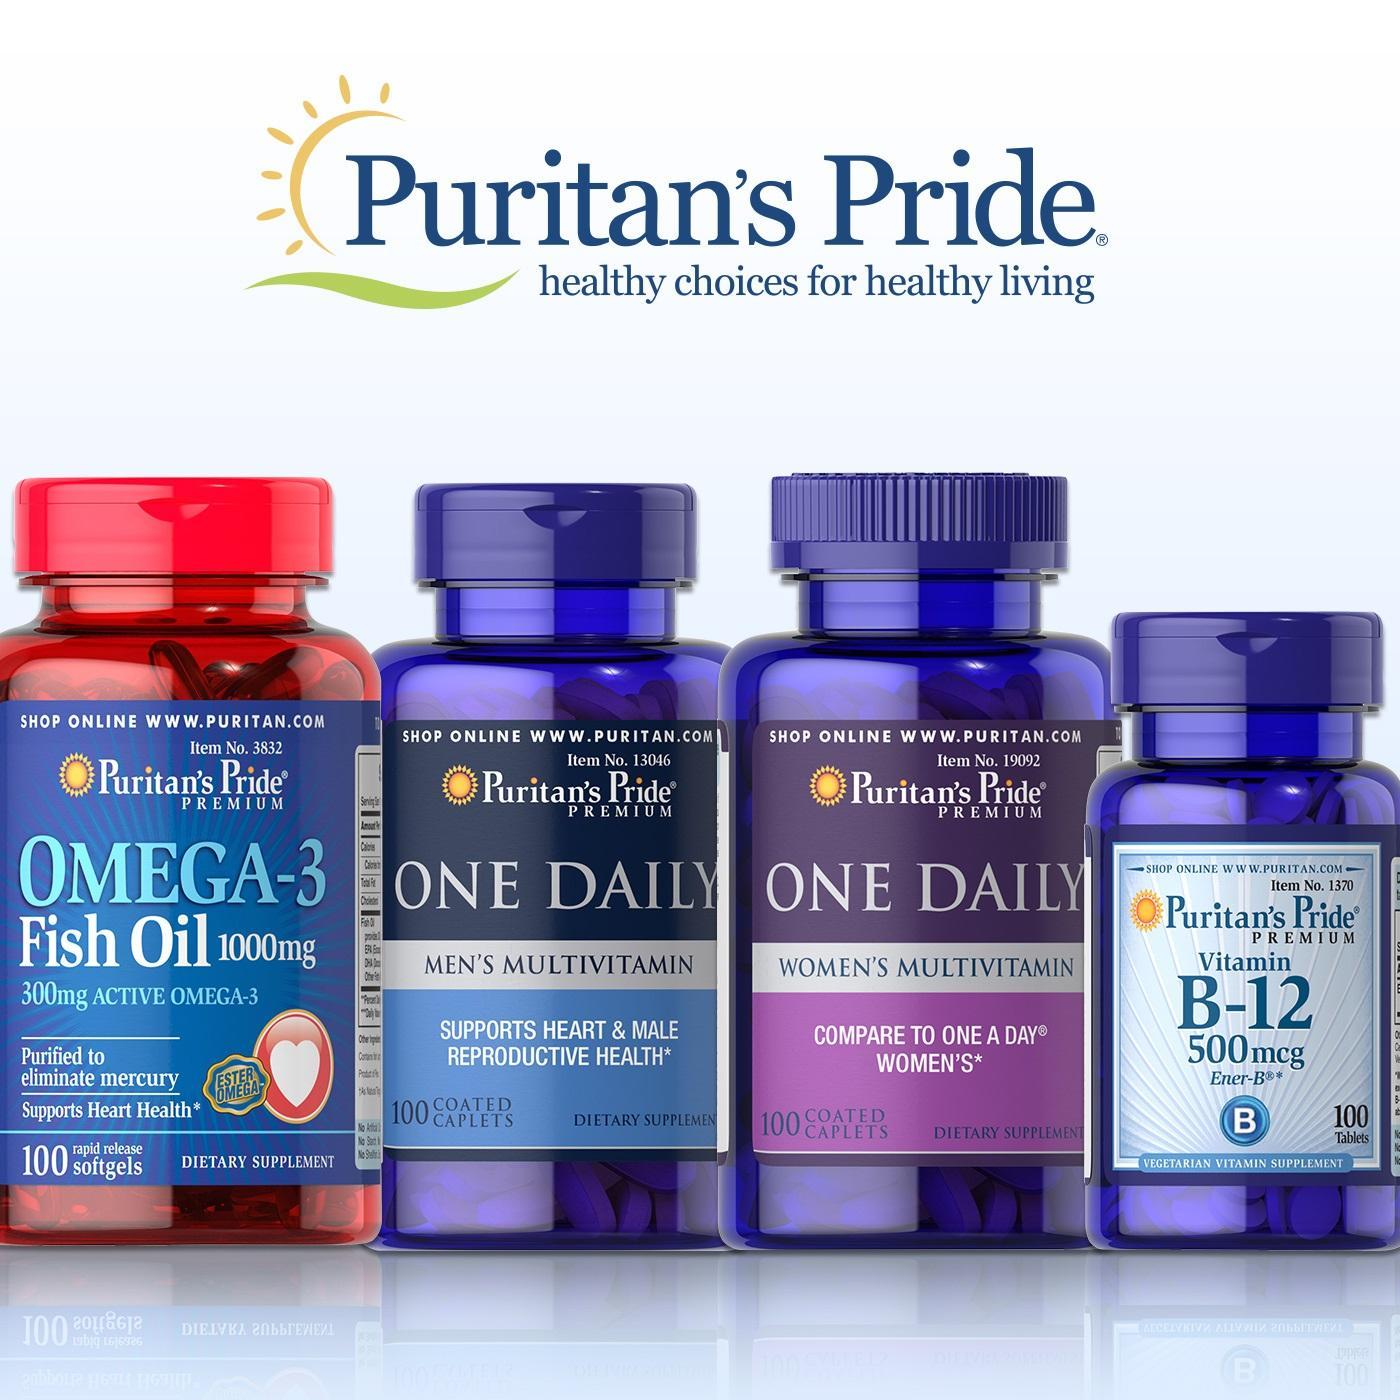 Puritan's Pride 普丽普莱:精选 全场自营产品